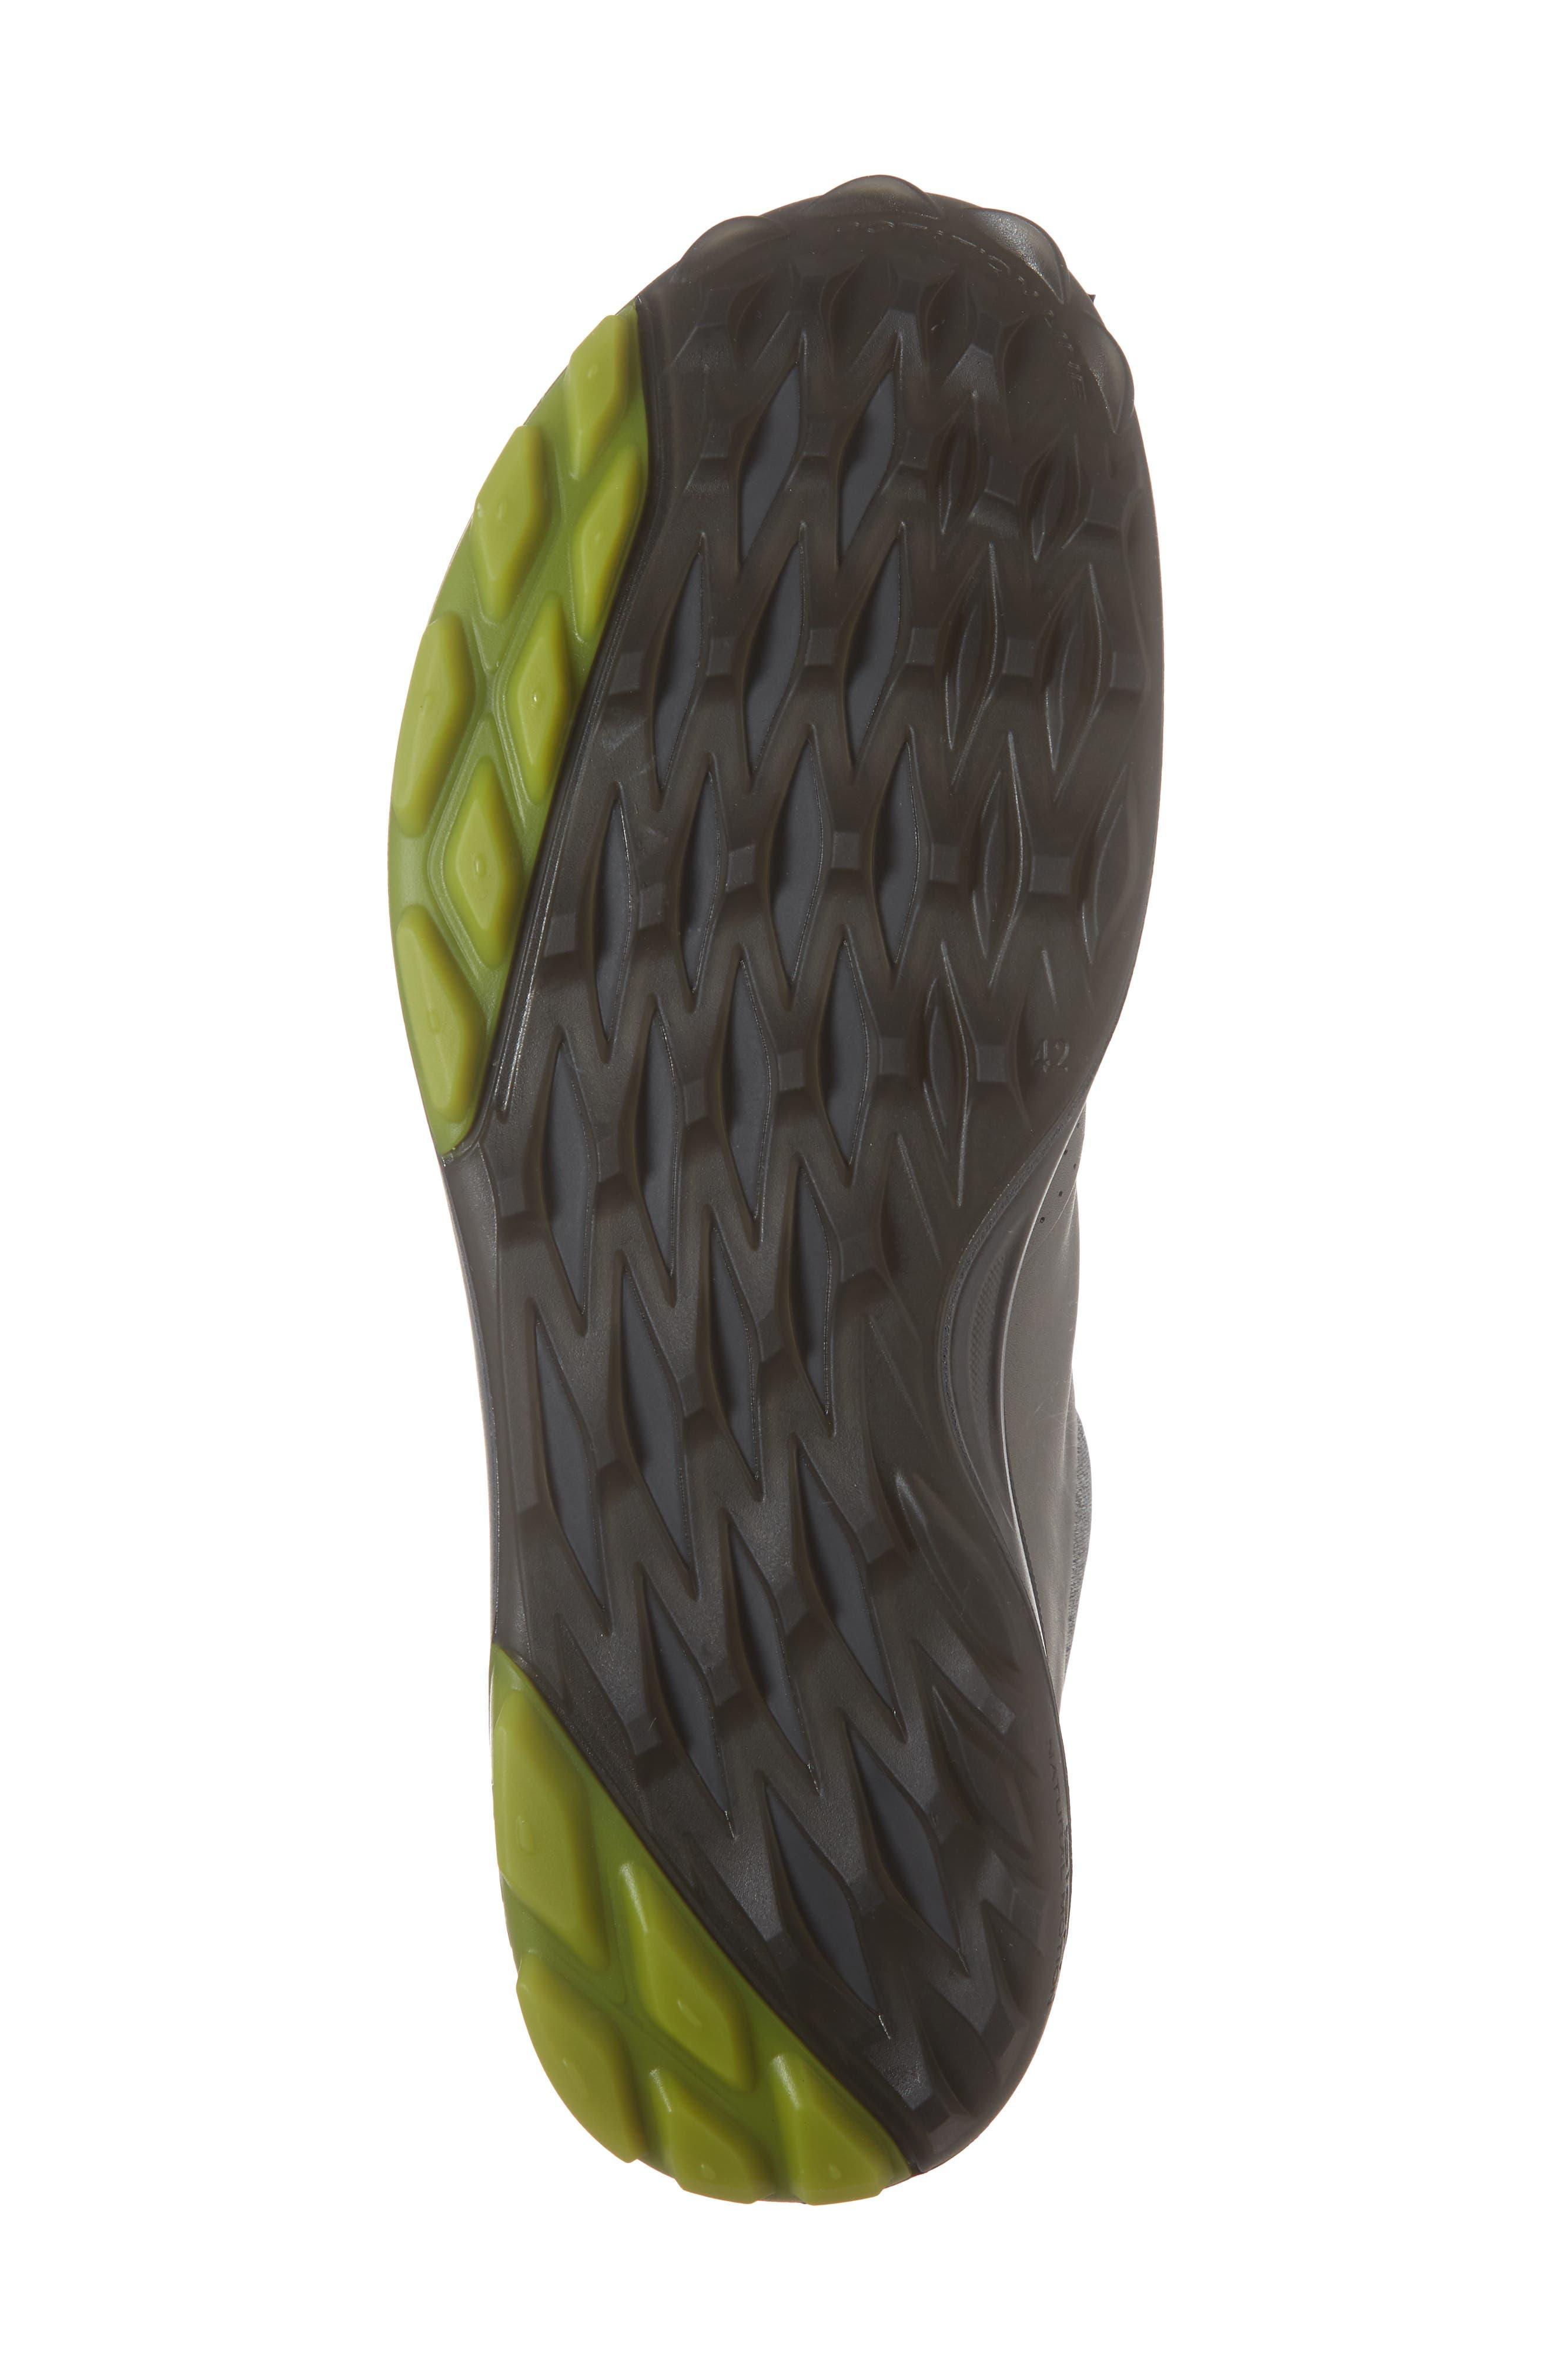 ECCO,                             BIOM Hybrid 3 Gore-Tex<sup>®</sup> Golf Shoe,                             Alternate thumbnail 6, color,                             WILD DOVE/ KIWI LEATHER